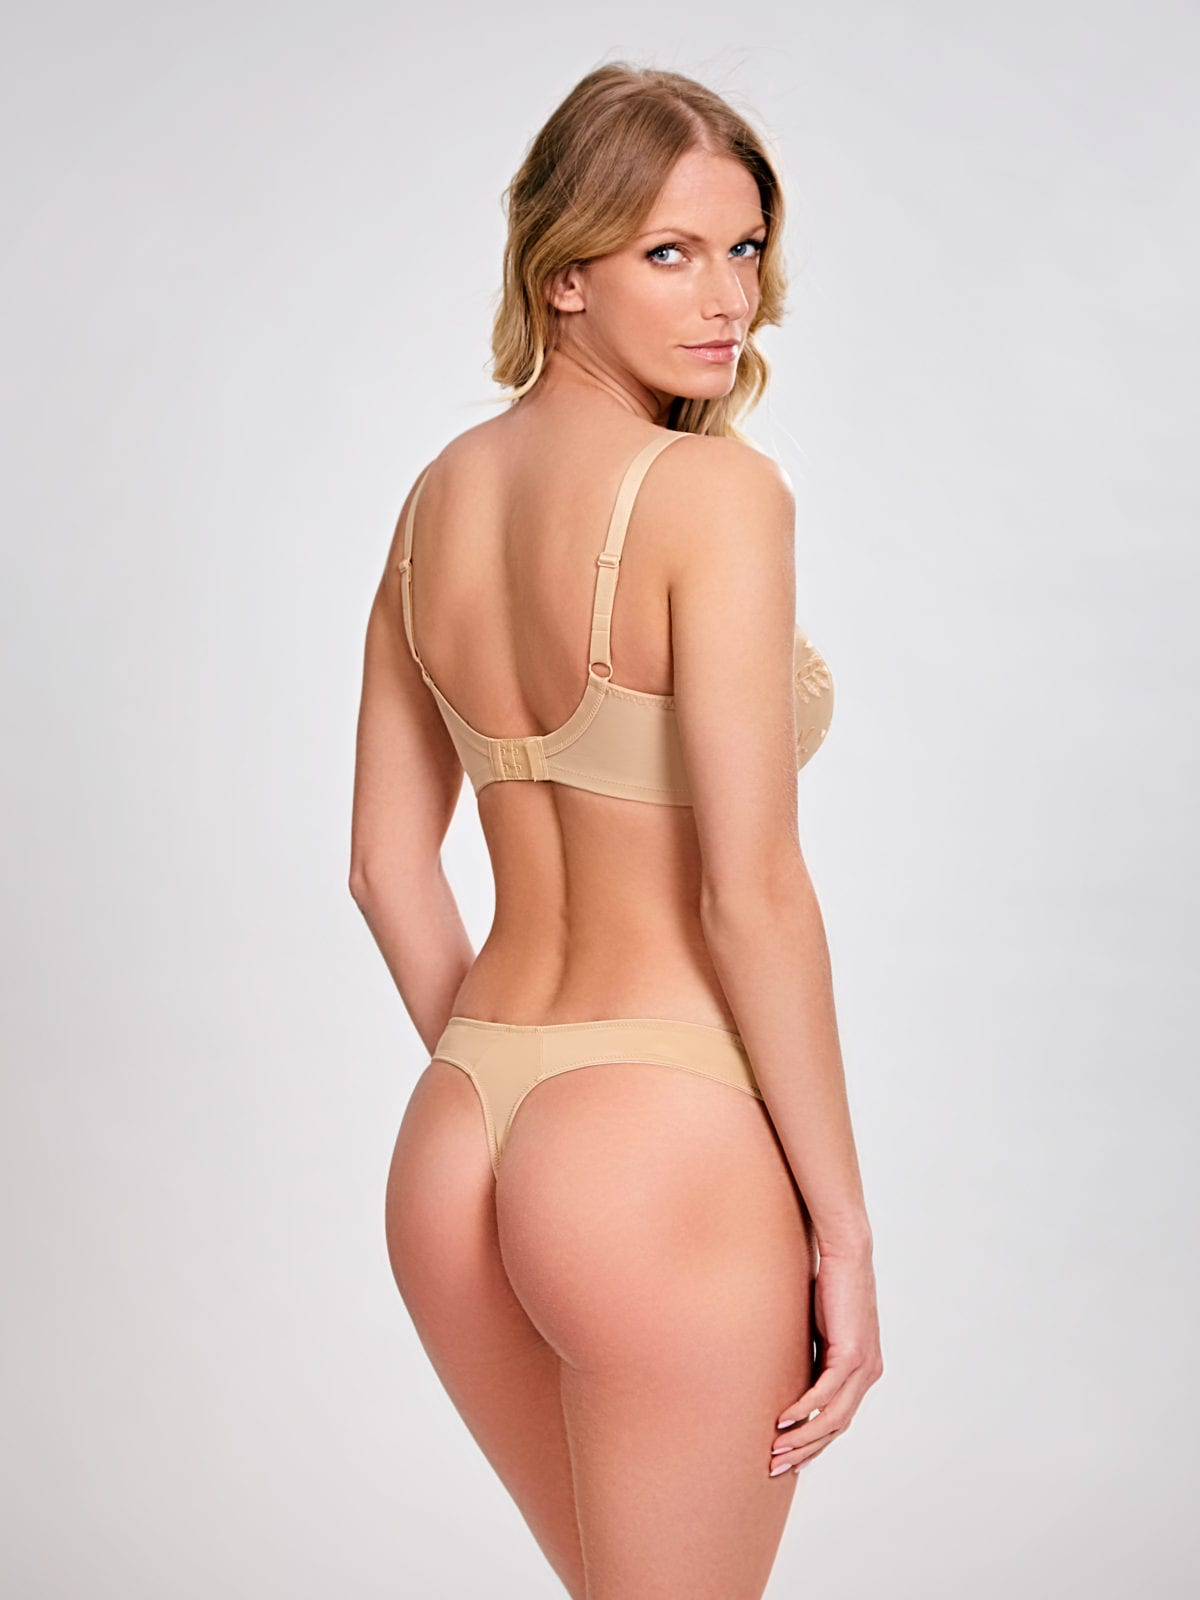 Базовое белье 3251_208_Tango Balconnet Bra Nude Back Trade 6